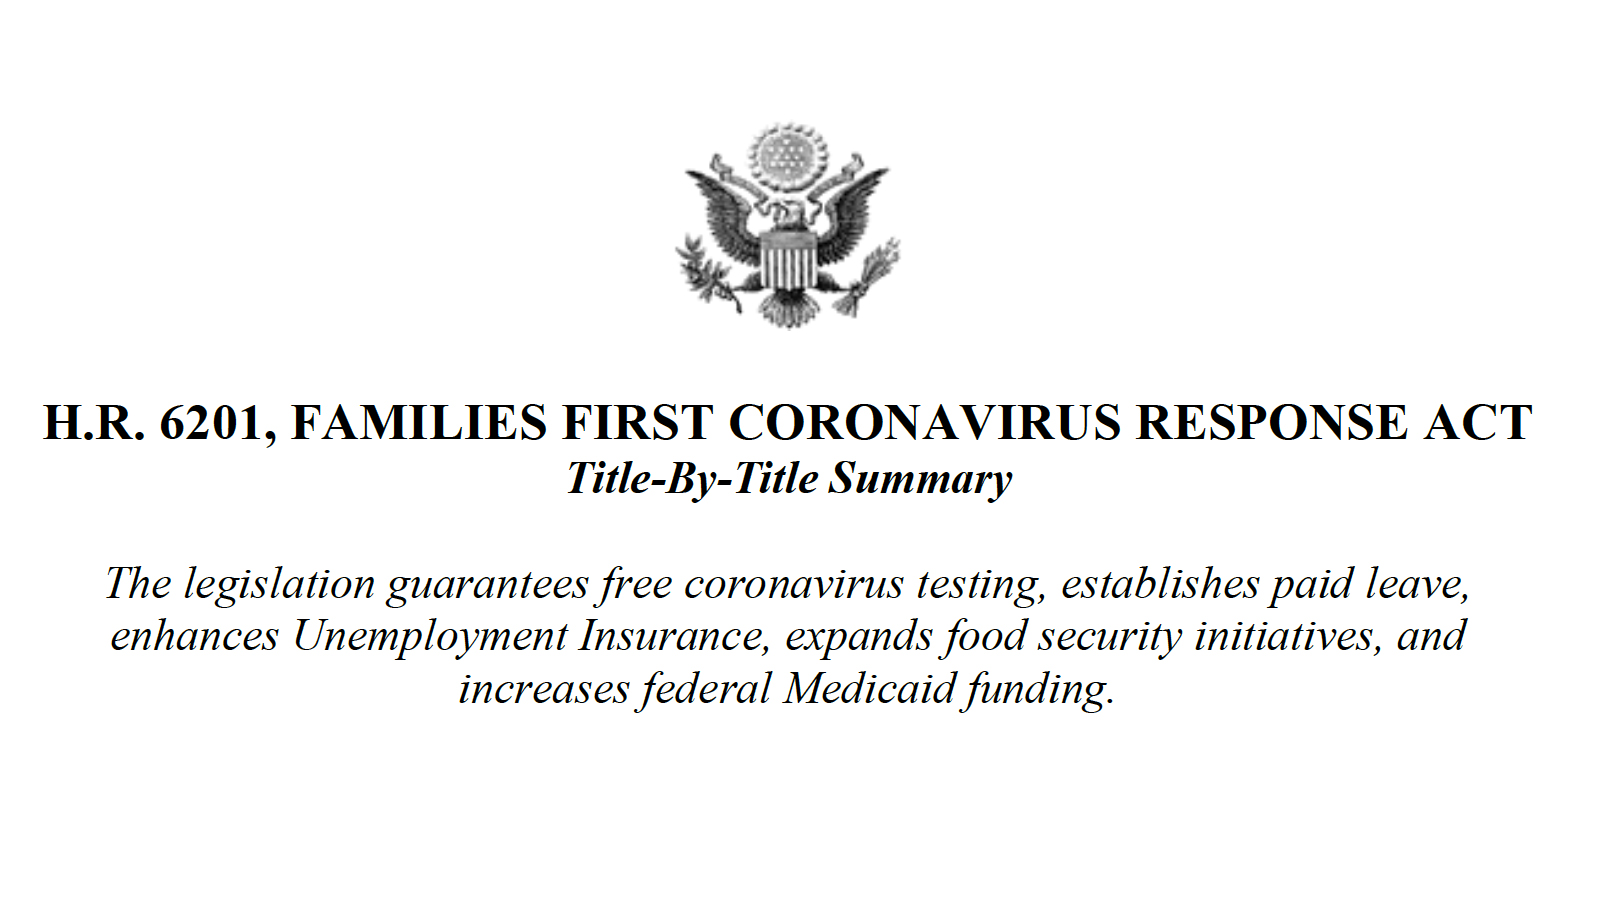 Families First Coronavirus Response Act Summary